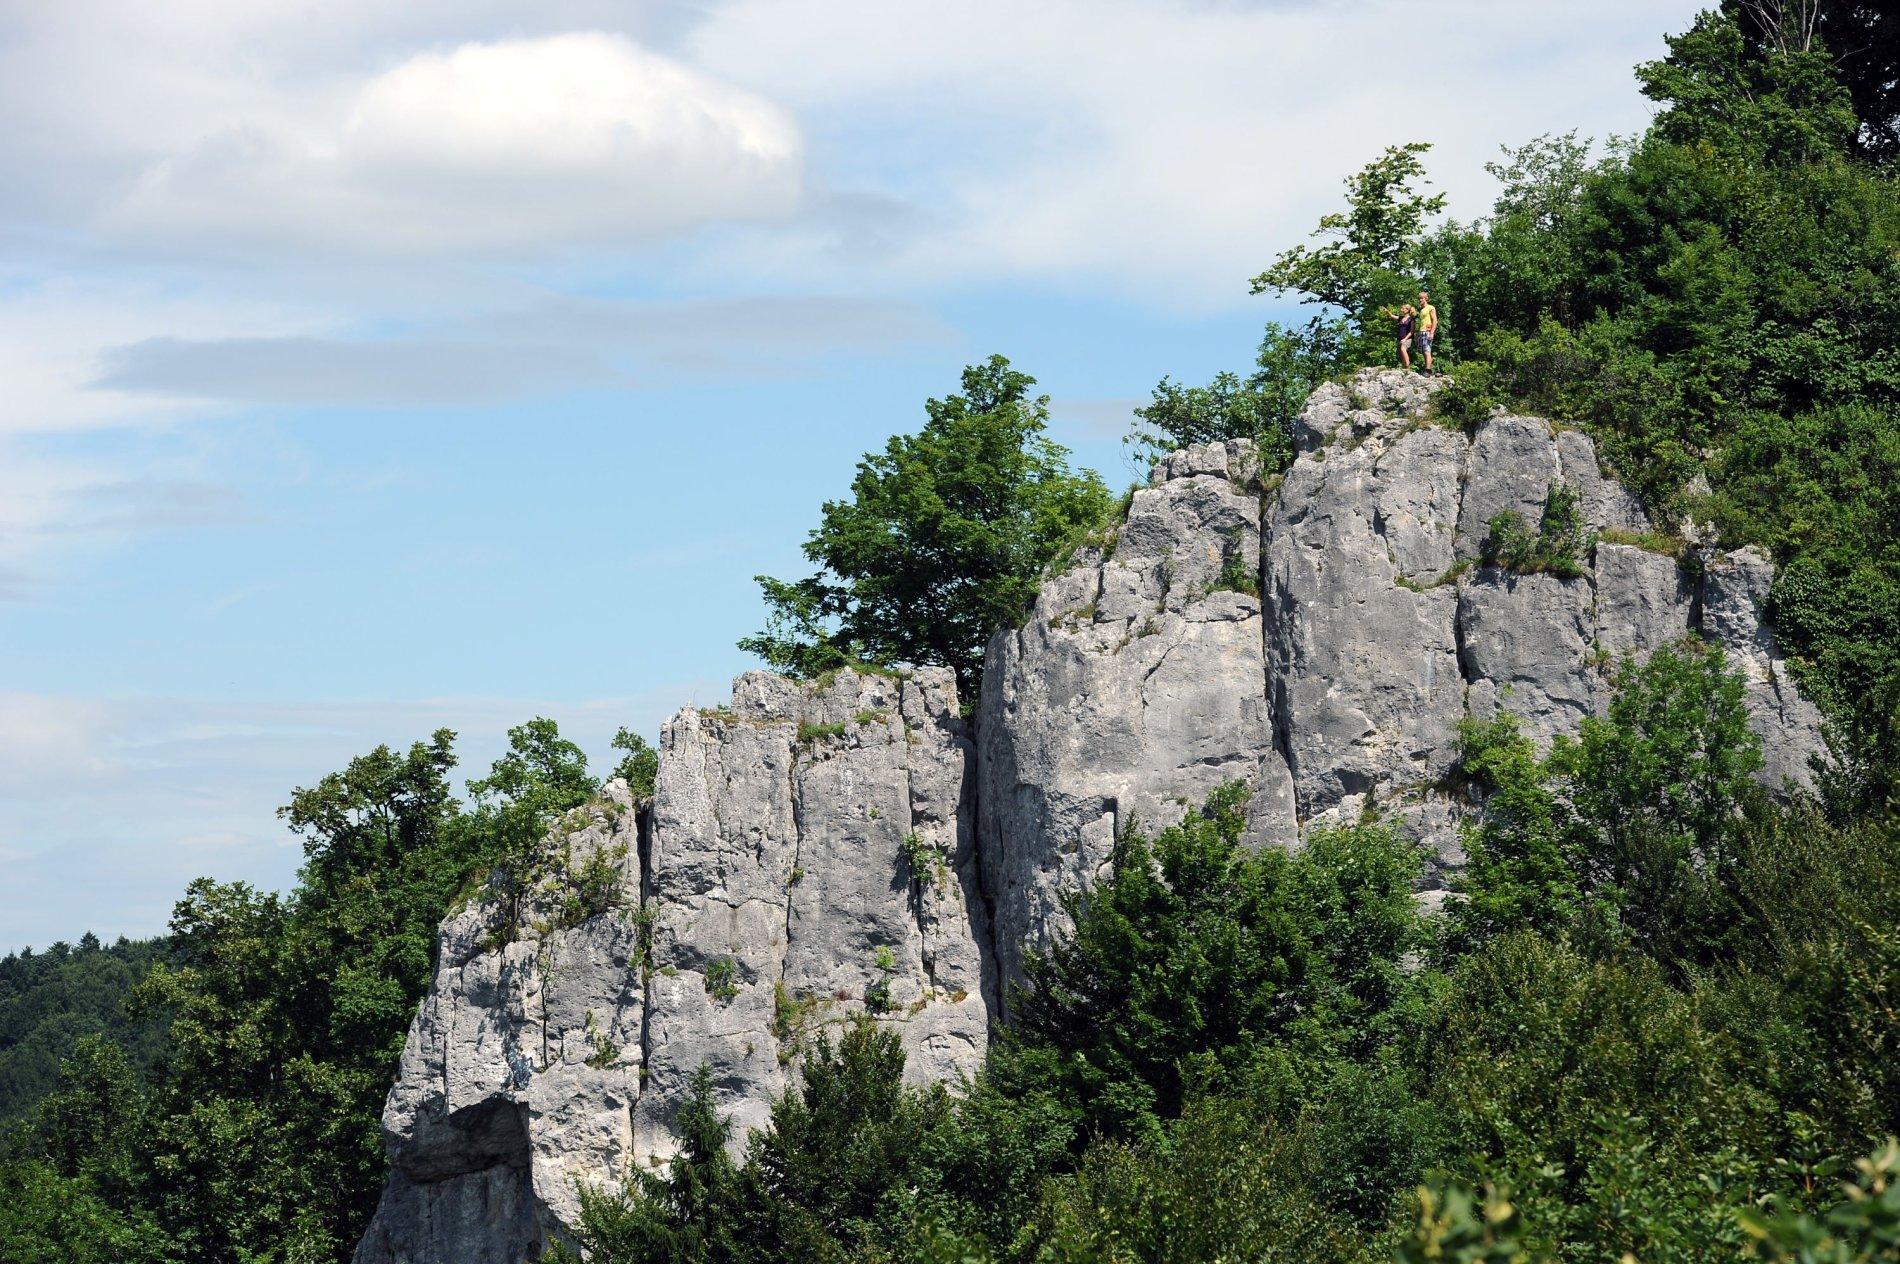 Gigantischer Schlossfelsen am Traufgang Schlossfelsenpfad in Albstadt